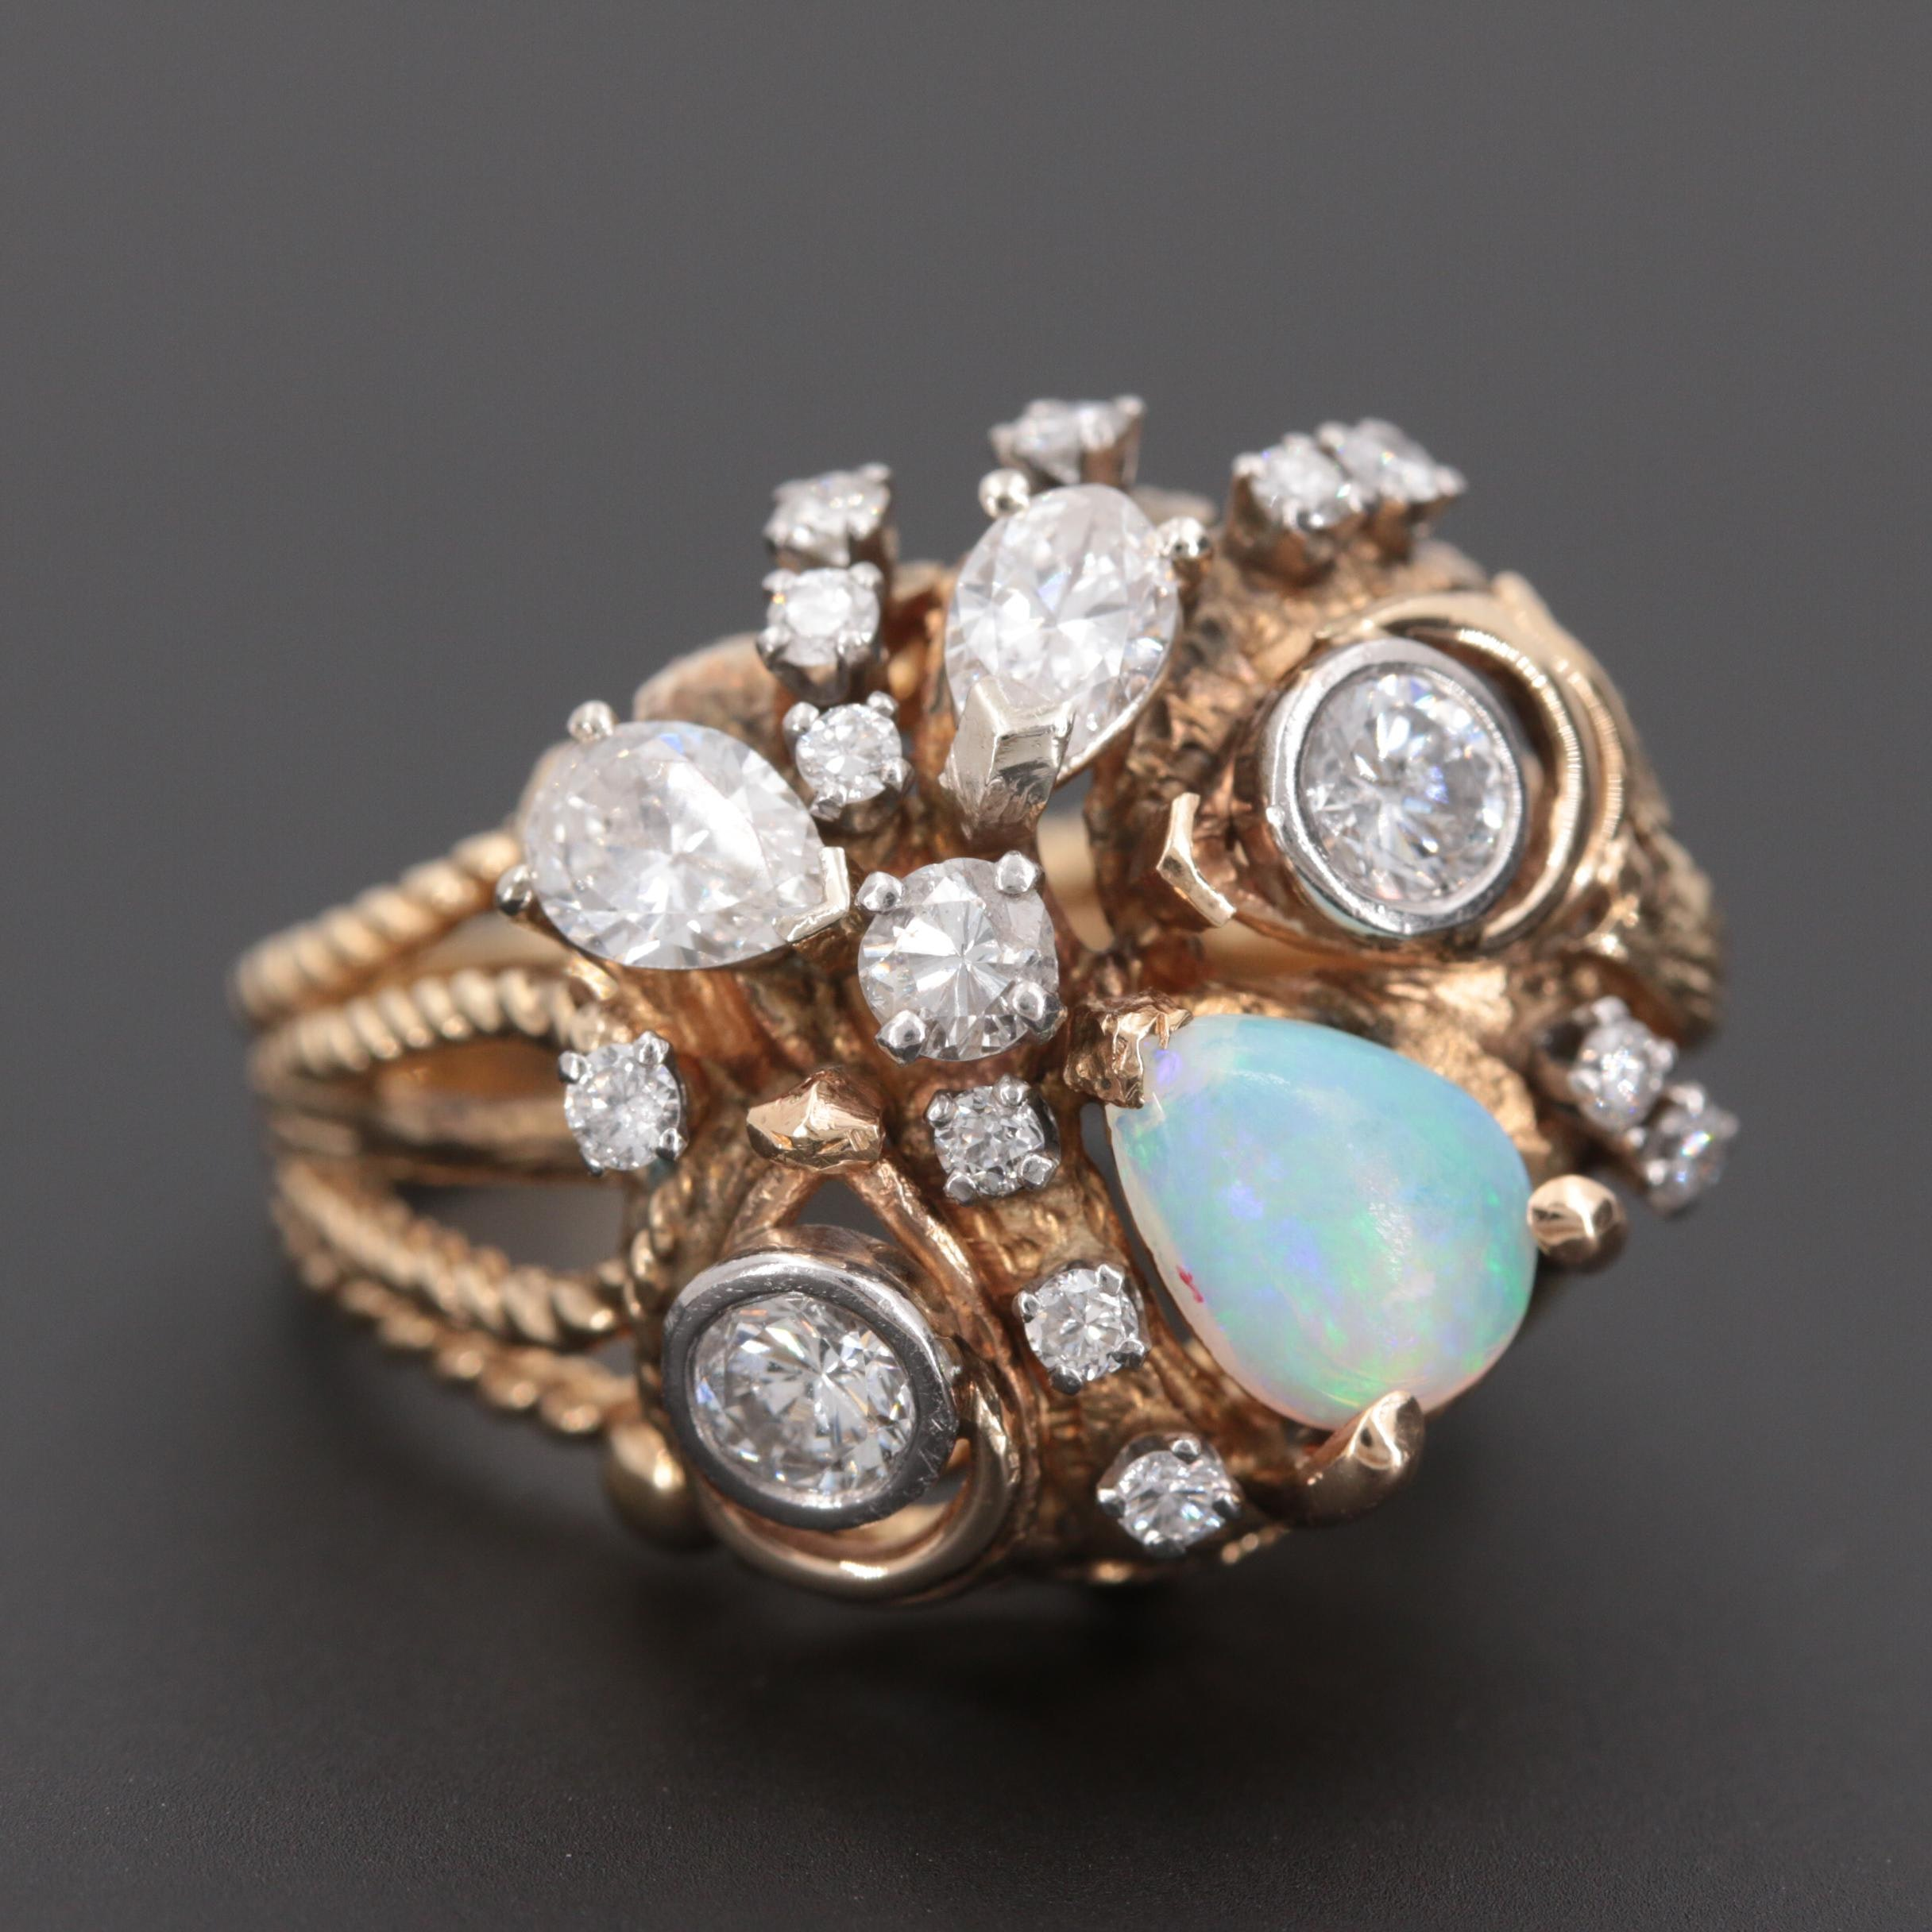 14K Yellow Gold and Palladium 1.58 CTW Diamond and Opal Ring